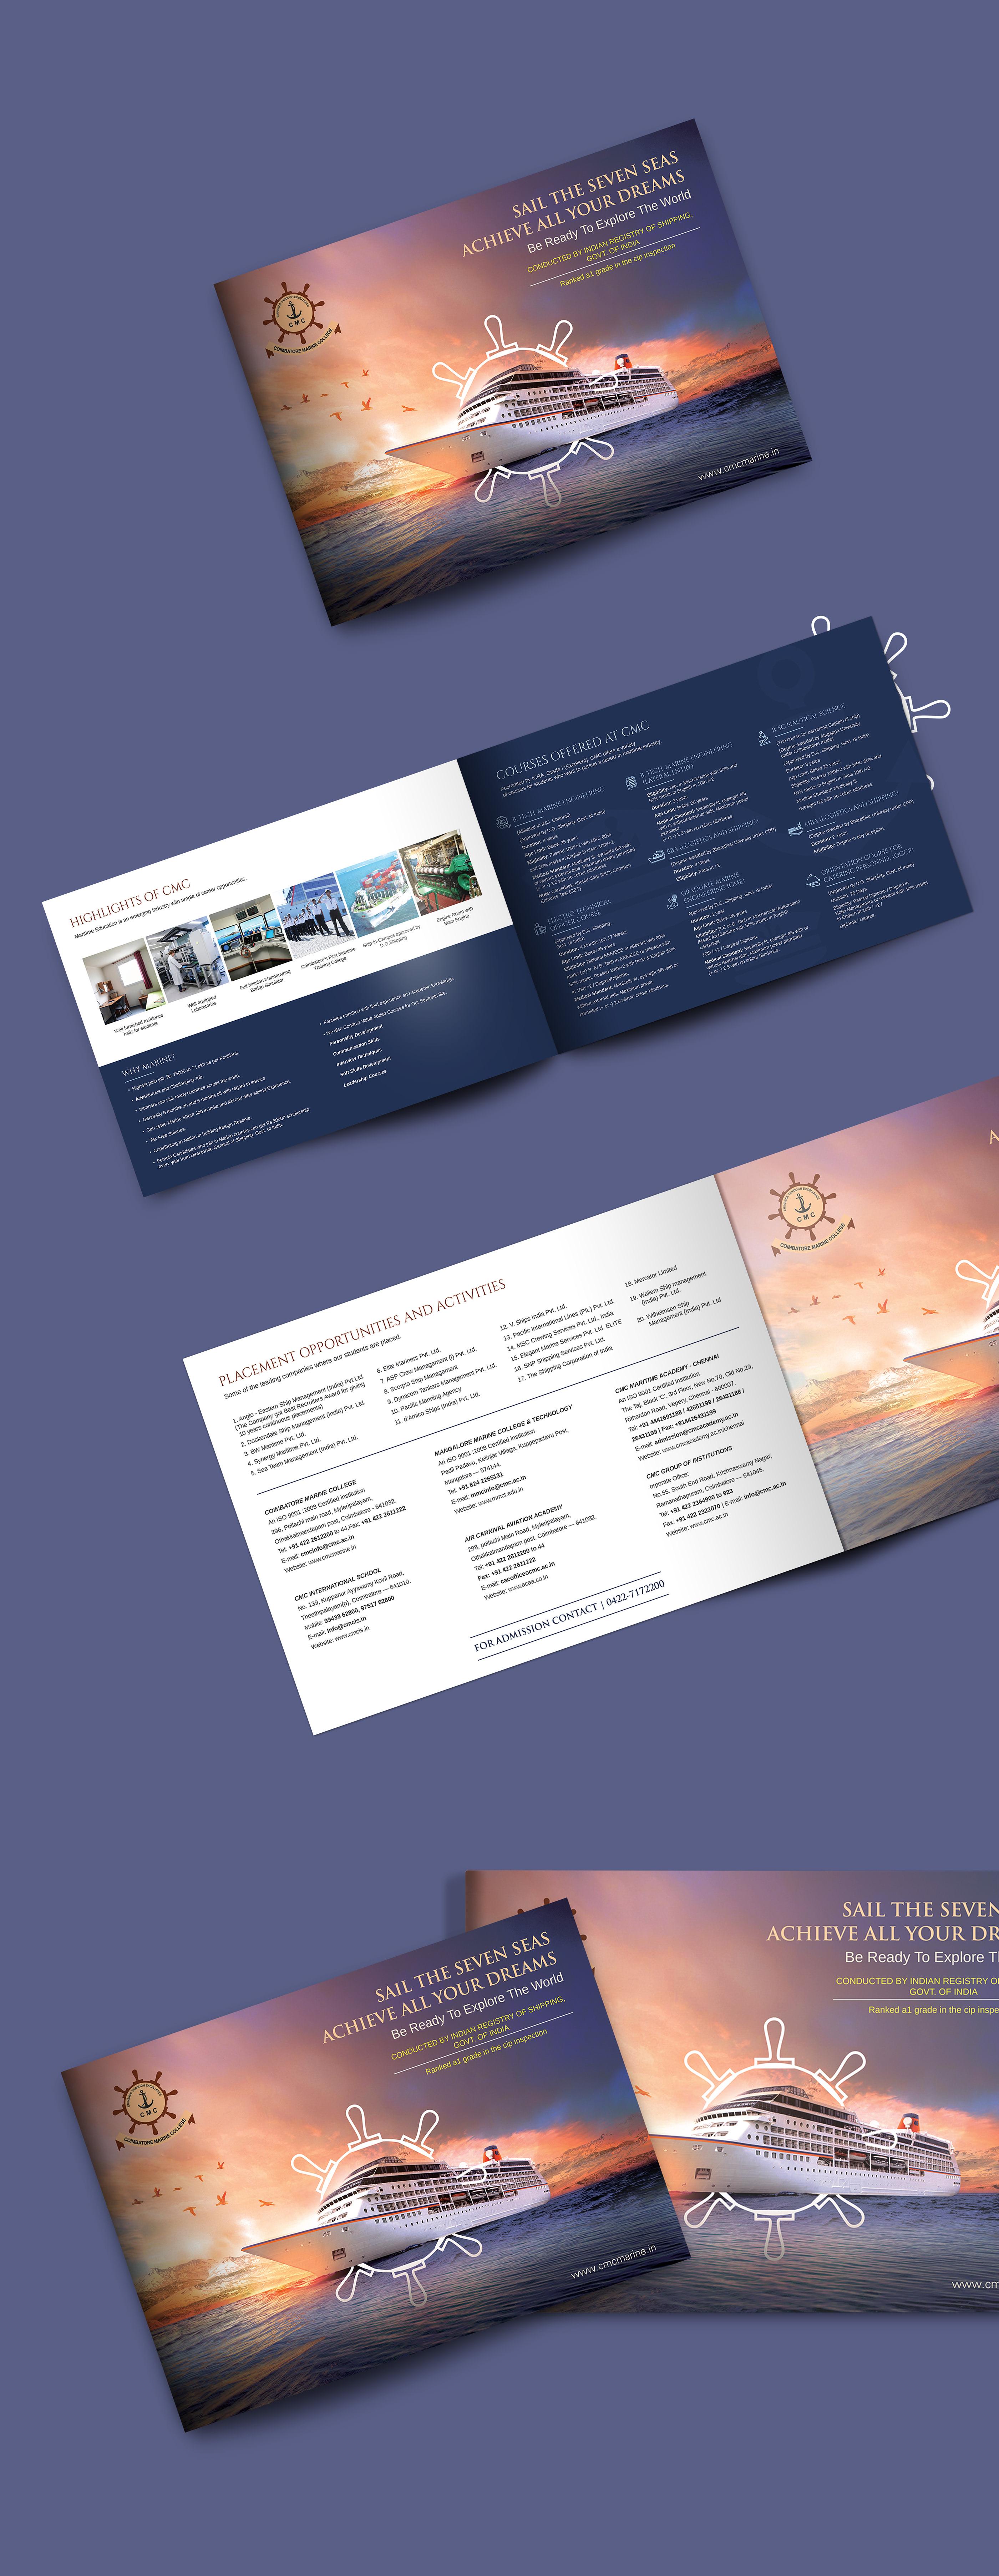 Marine College Brochure Branding | Graphic Design 2018 on